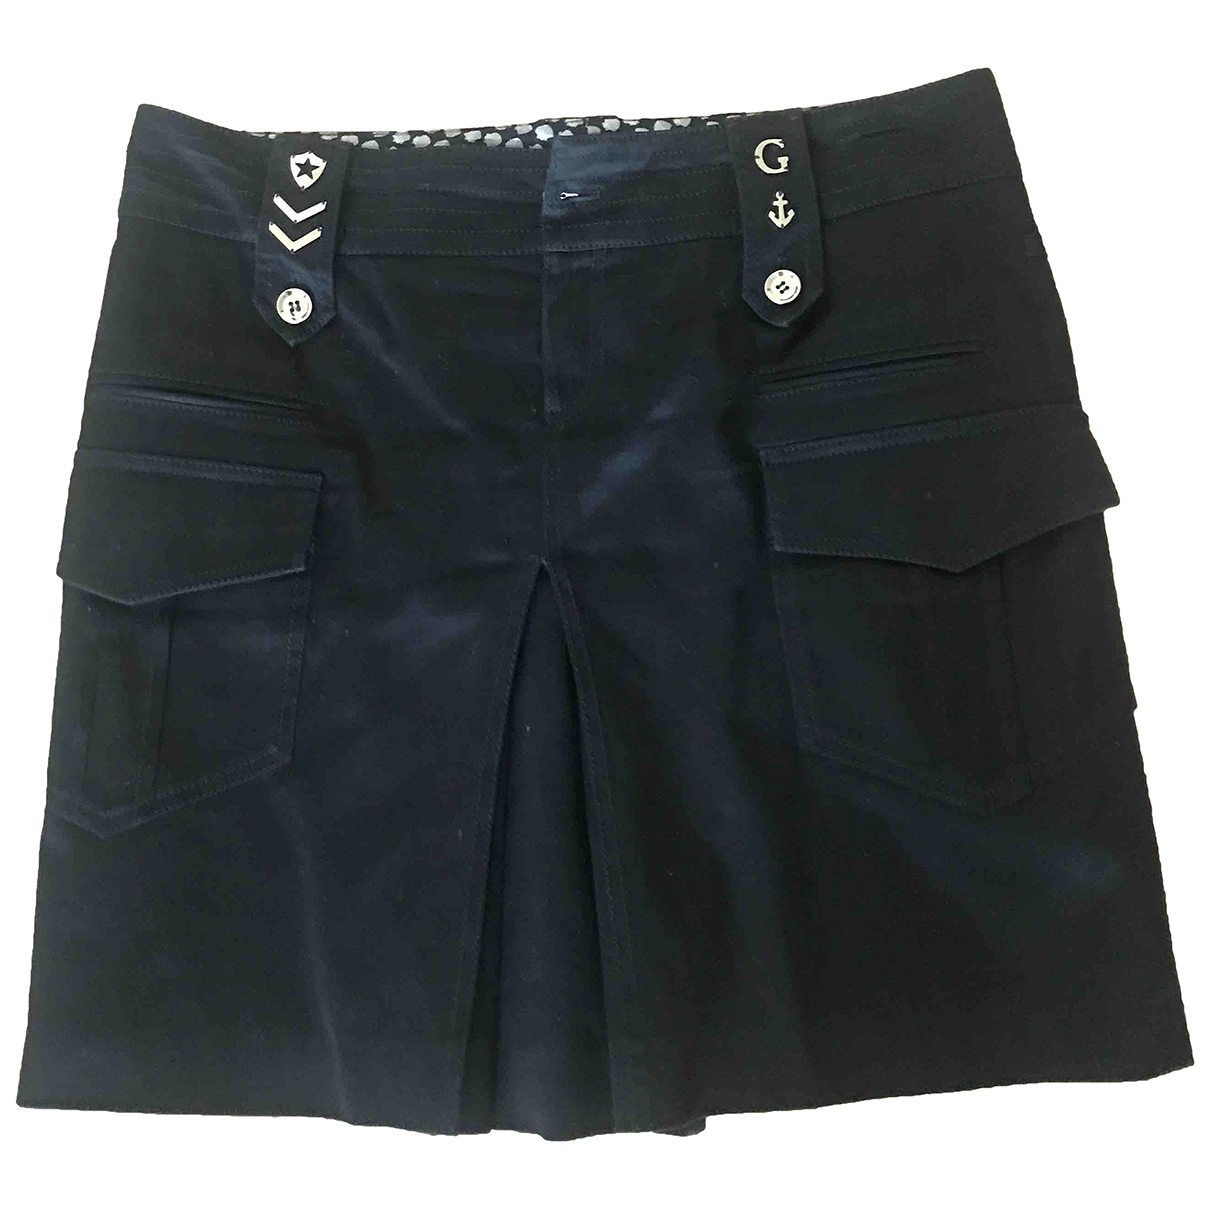 Gucci \N Black Cotton skirt for Women 44 IT